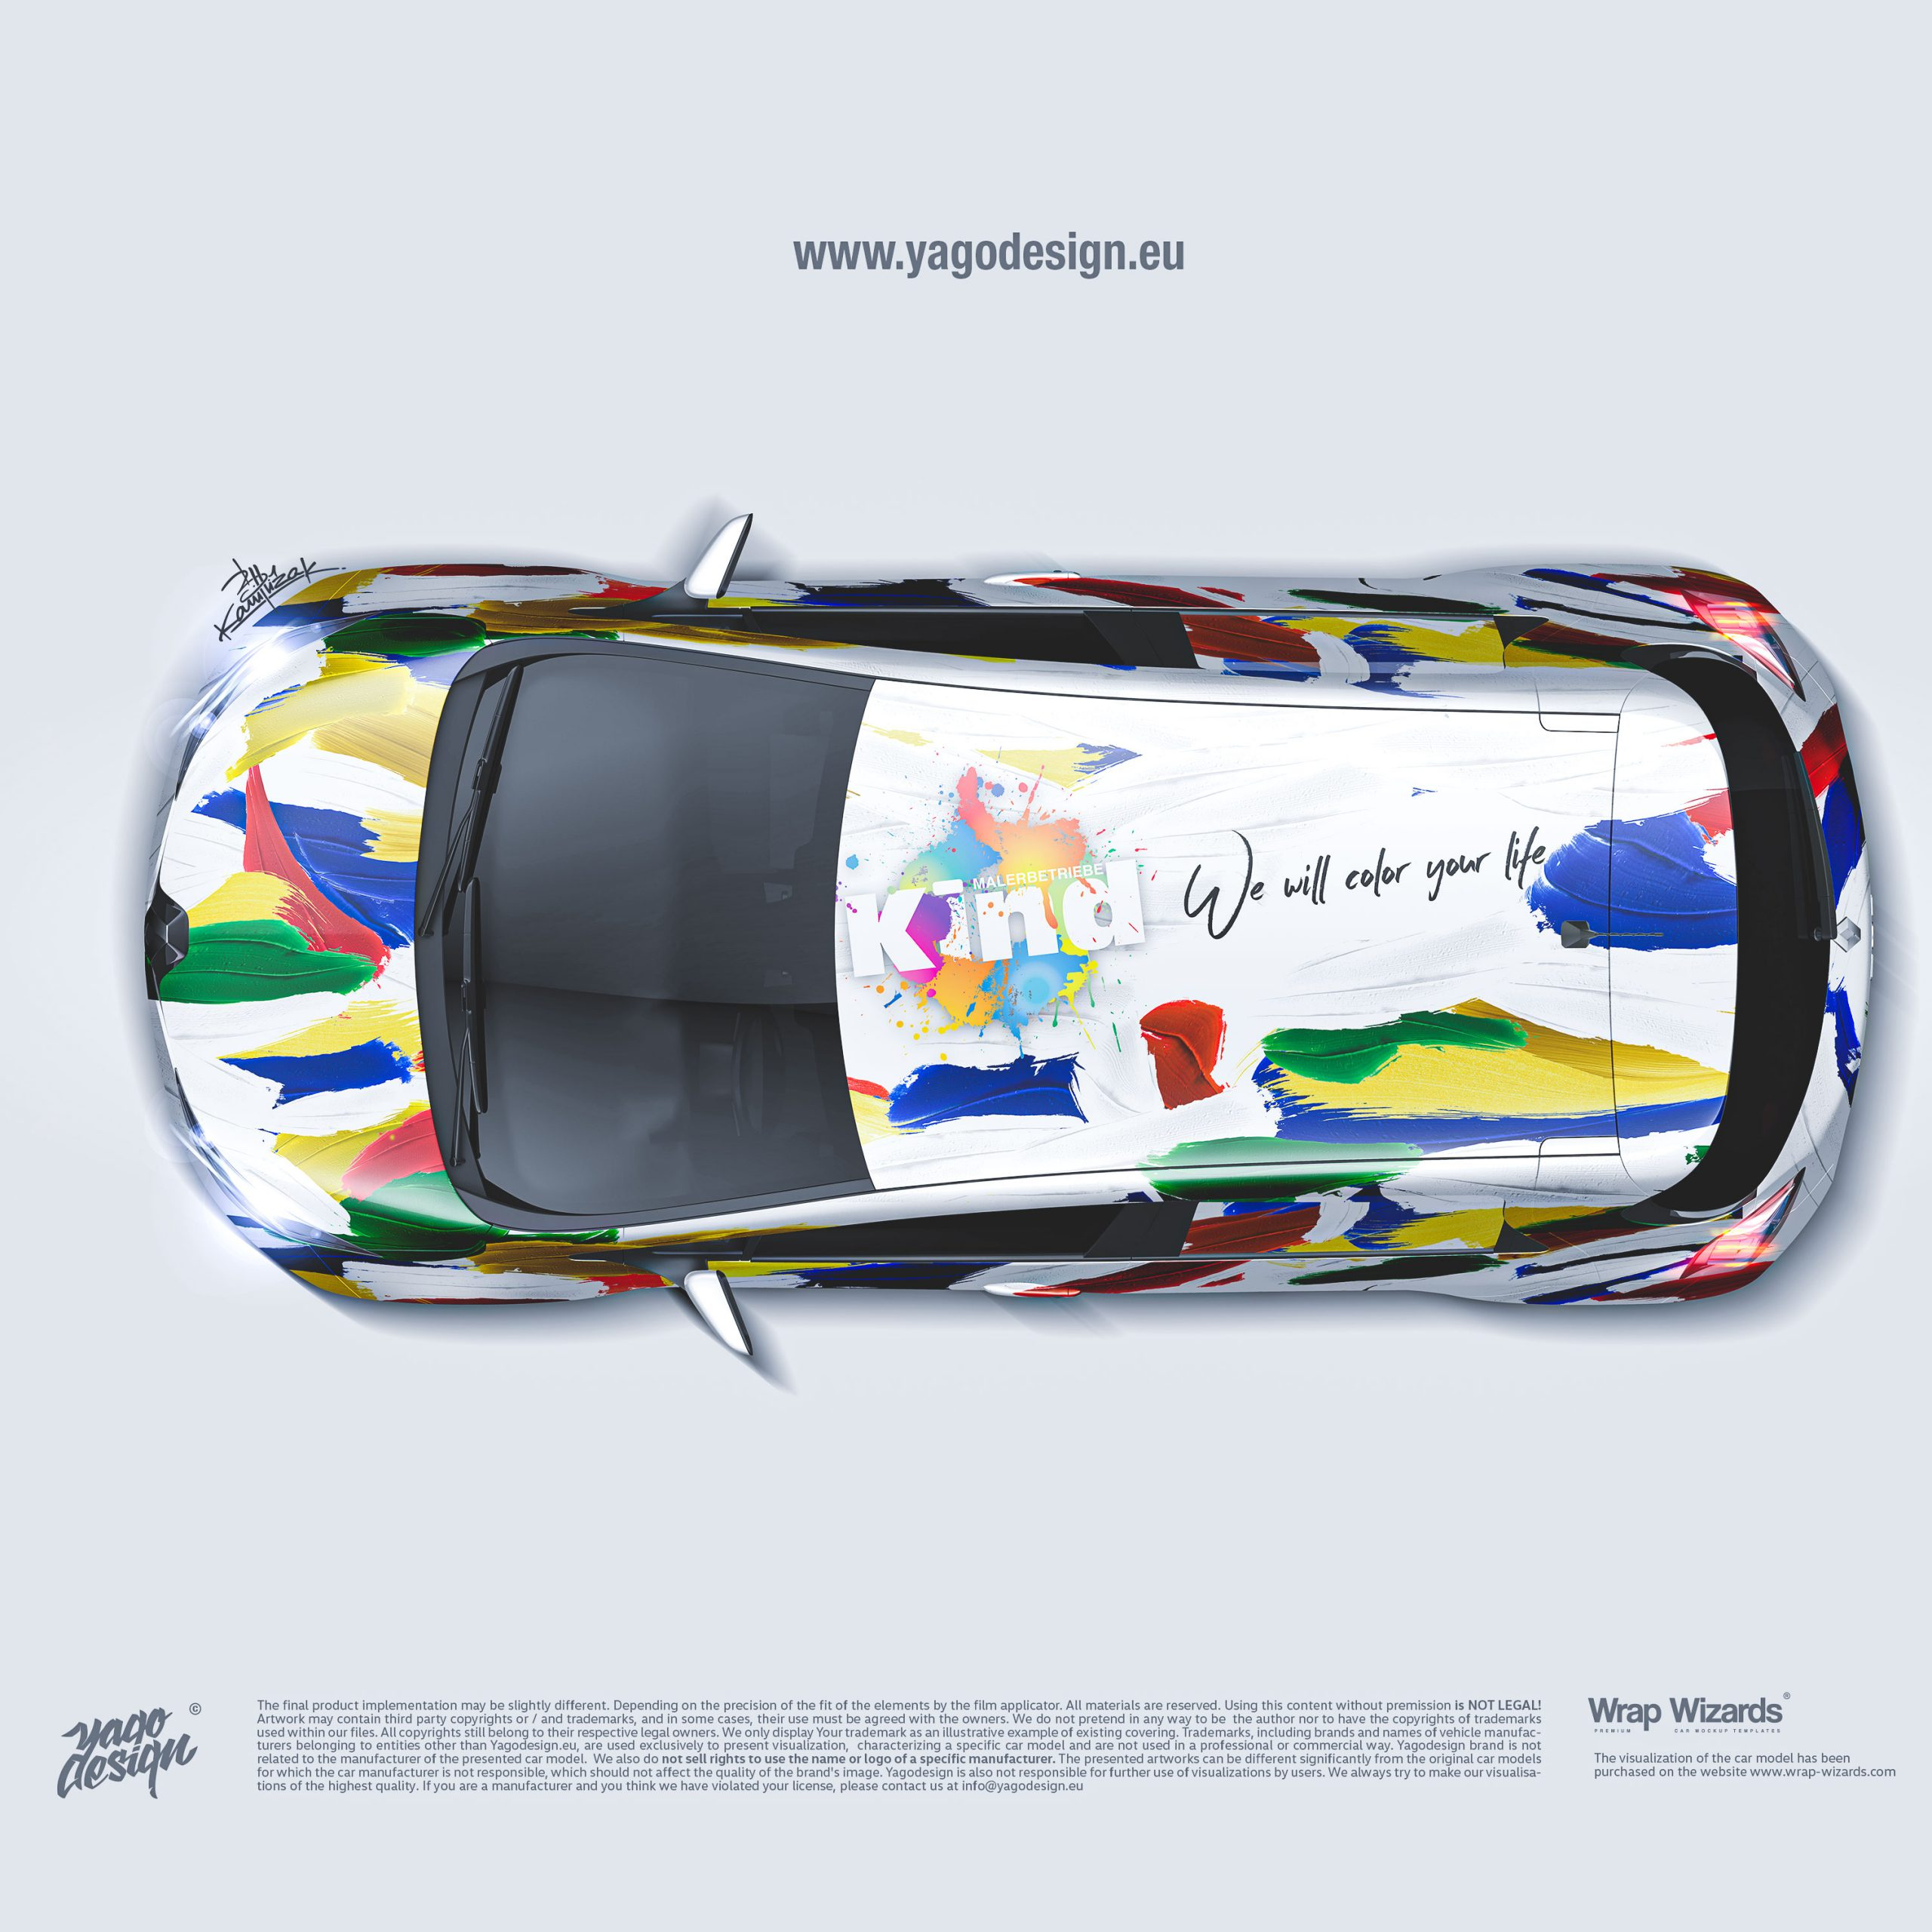 Renault-Zoe-2017-by-Yagodesign-by-Kamil-Lizak-by-Feinschliff-topview